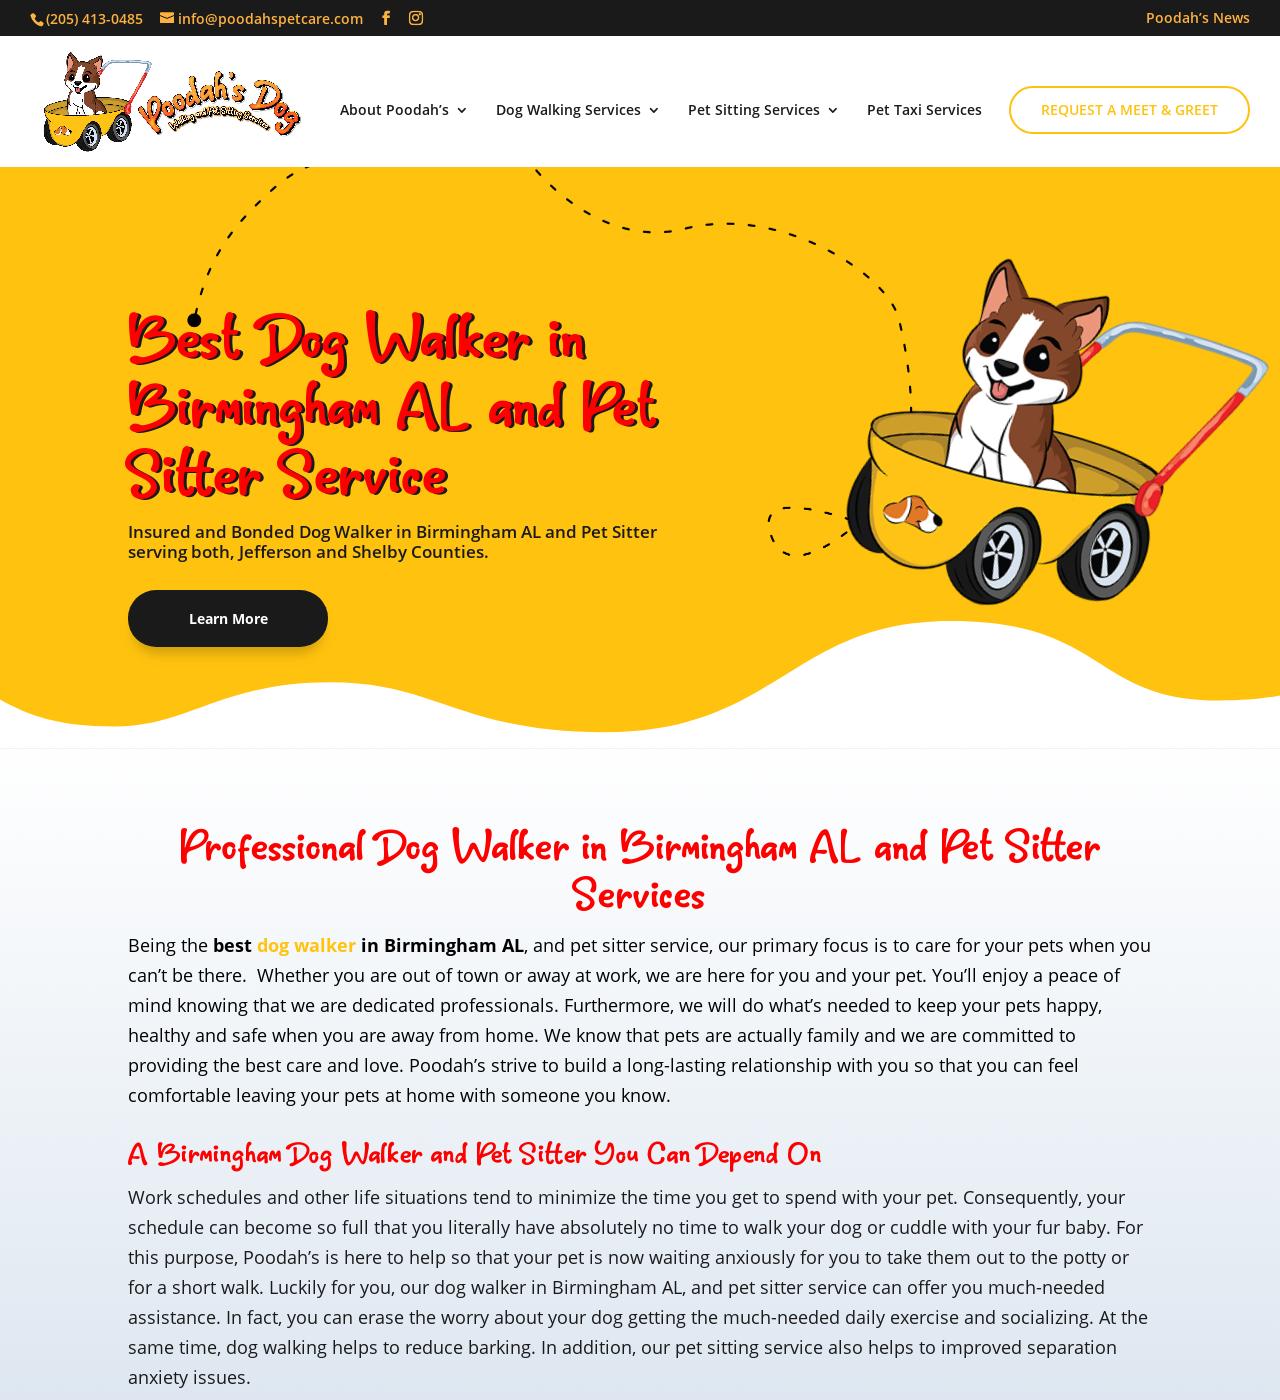 Birmingham Website Design Agency - C Kinion Design - Poodah's Dog Walking and Pet Sitting Services - Half Page